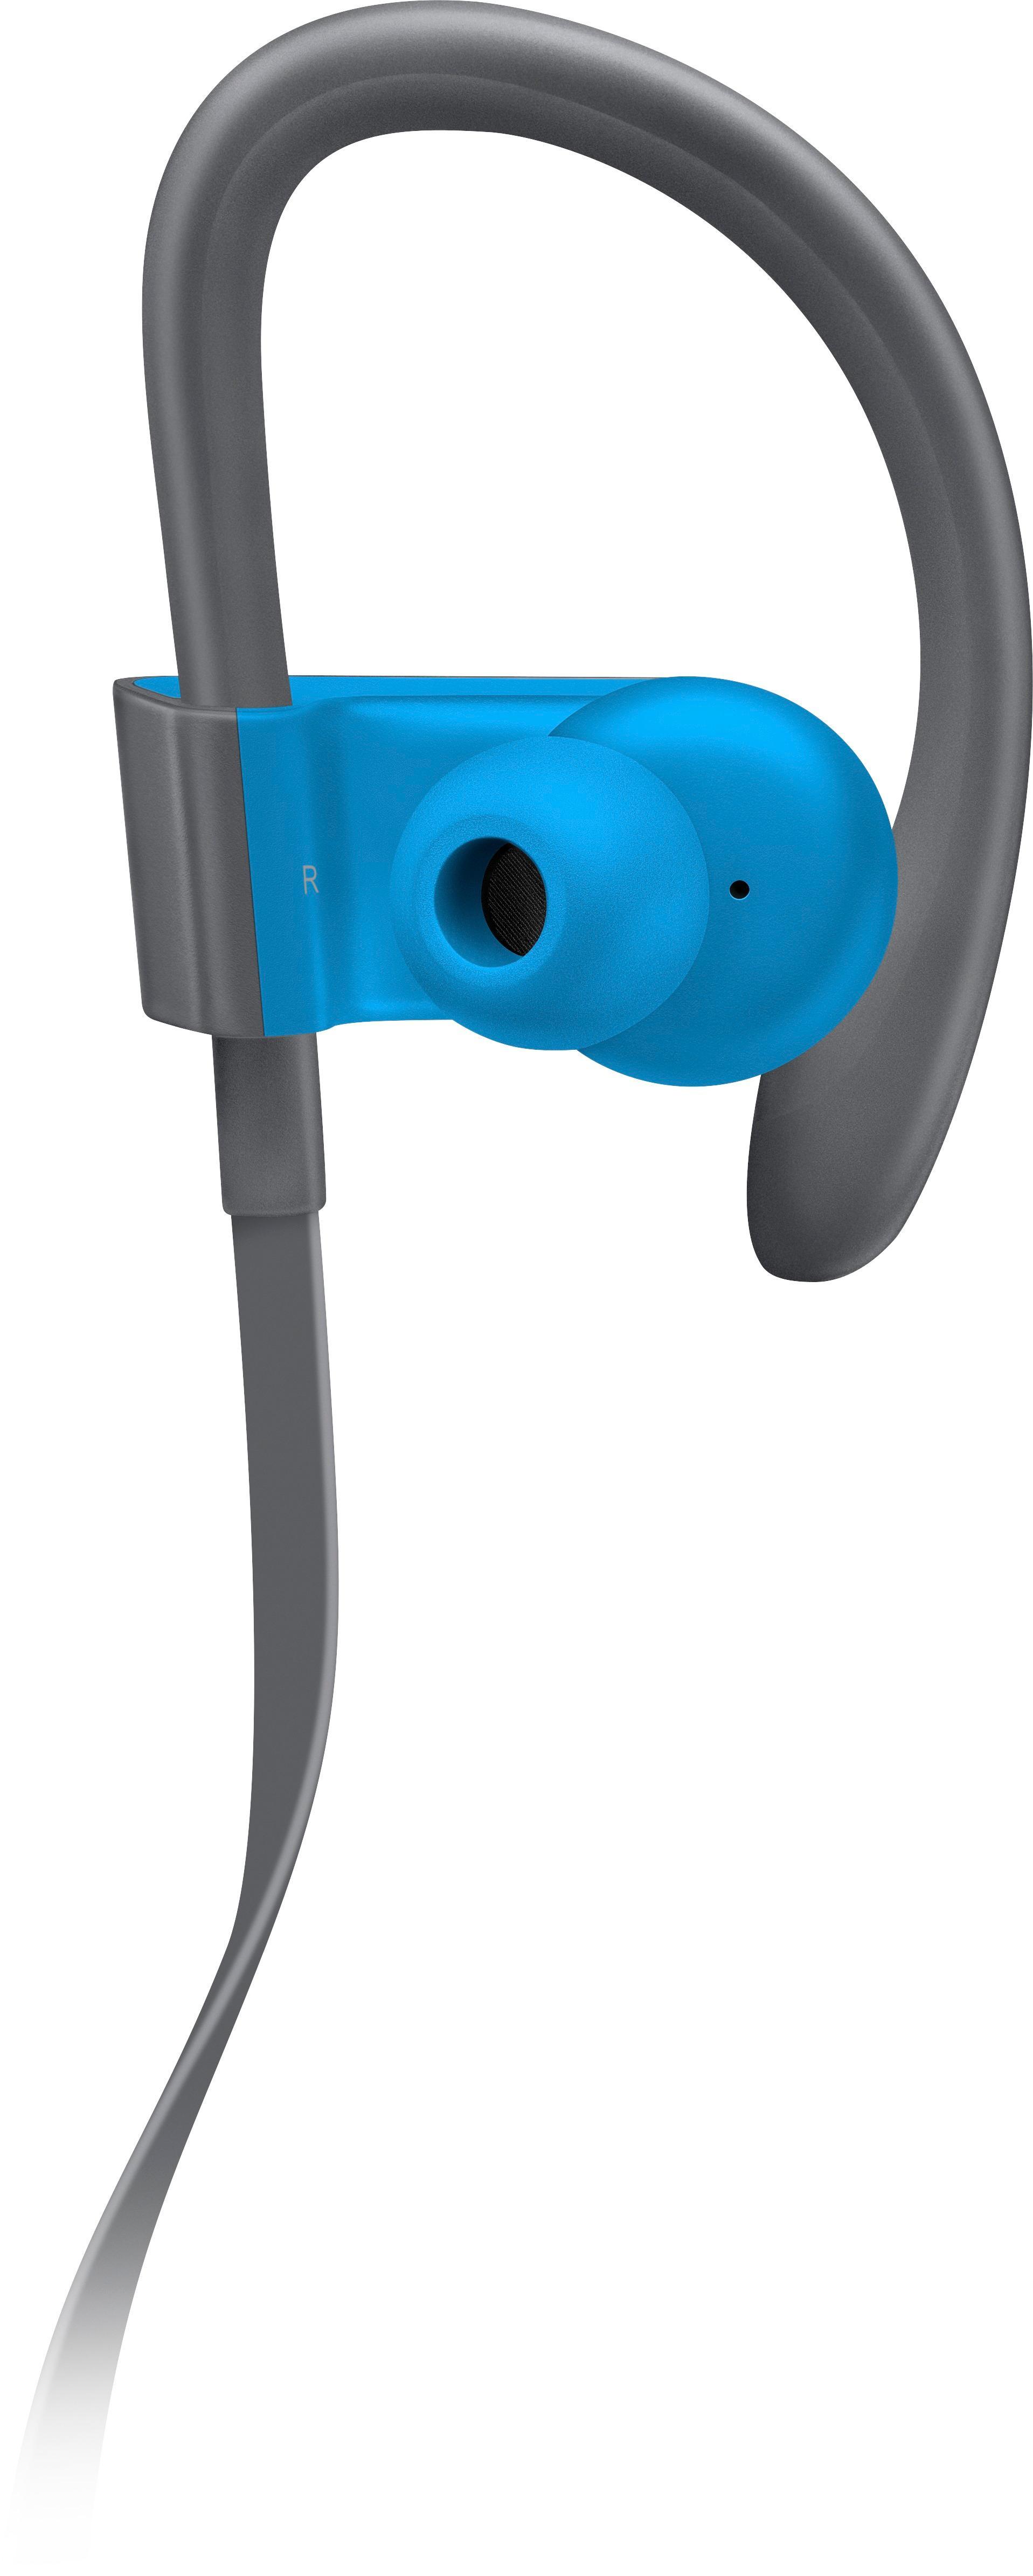 Beats by Dr. Dre - Geek Squad Certified Refurbished Powerbeats³ Wireless - Flash Blue $61.99